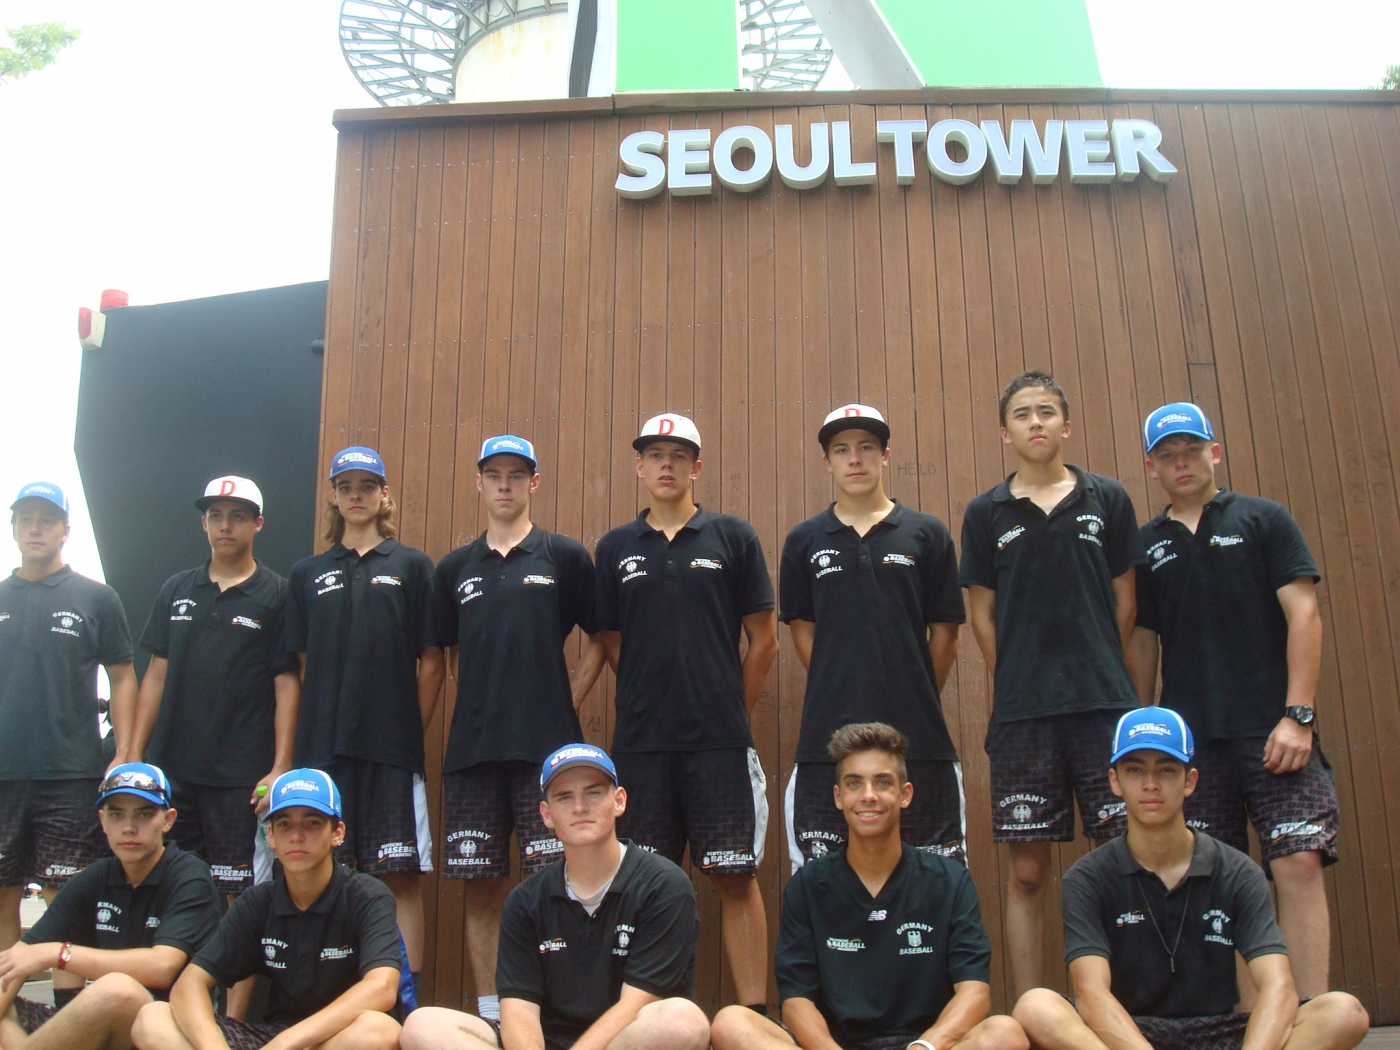 Korea 21 am Seoul Tower